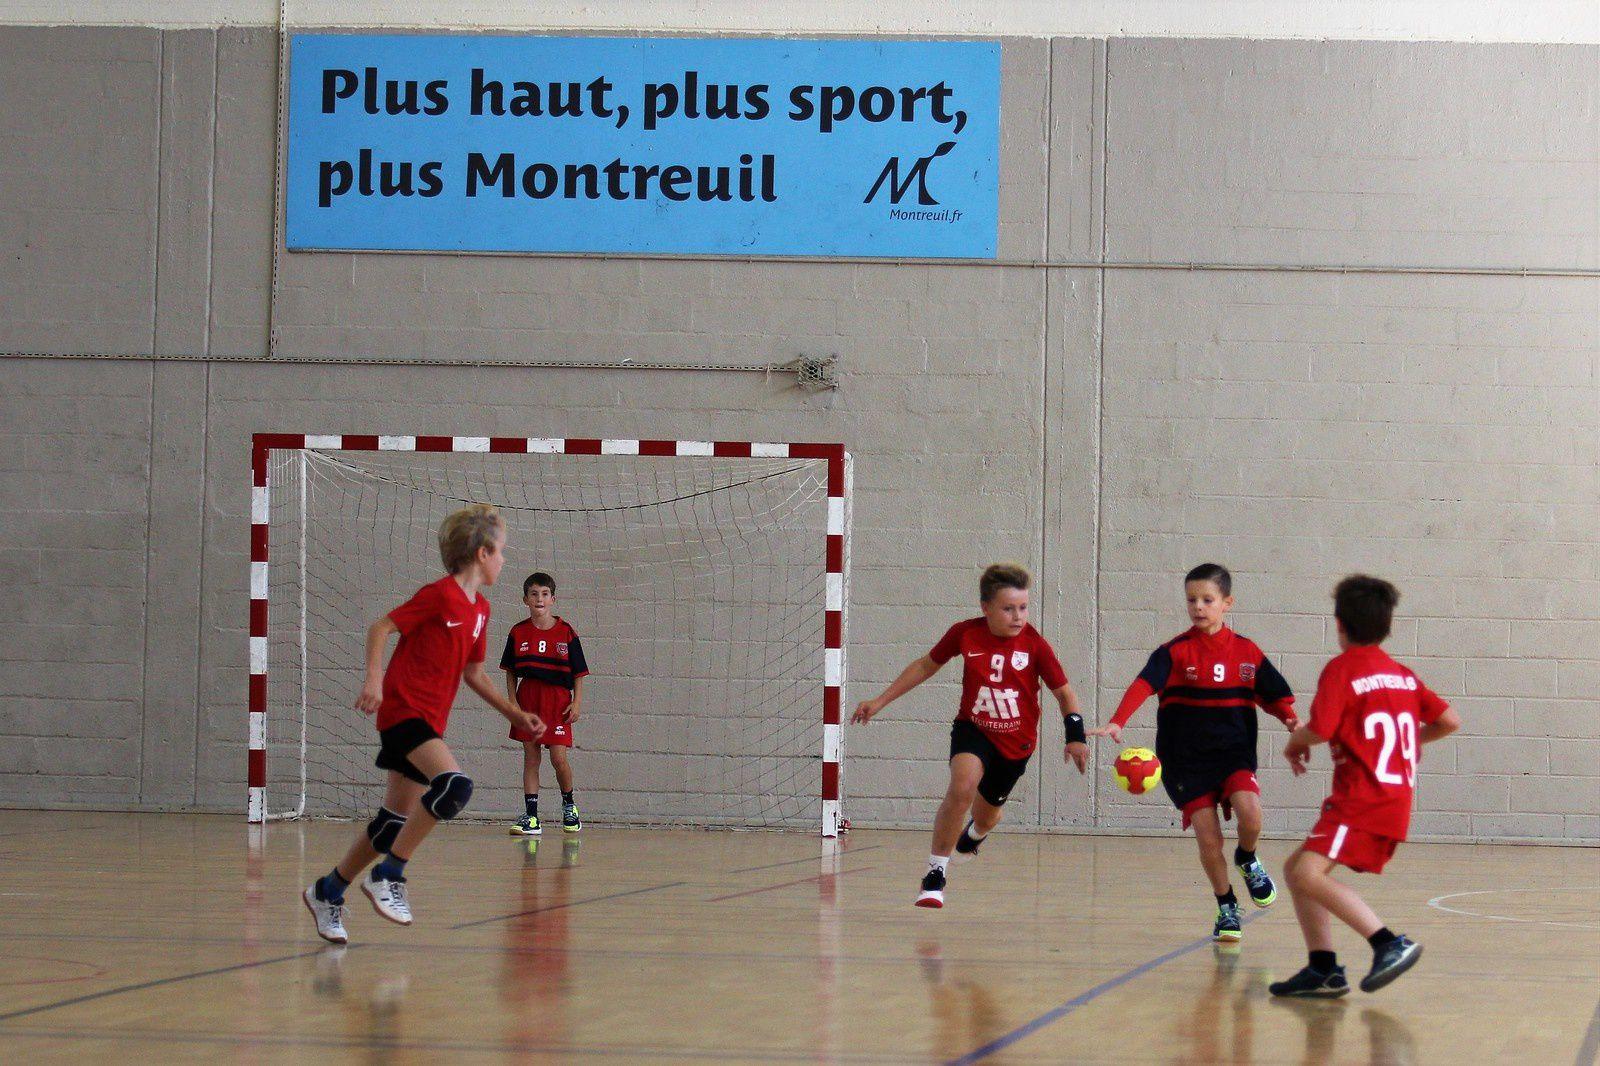 Montreuil vs SOR HB (J1 Brassage 93) Score : 35-11